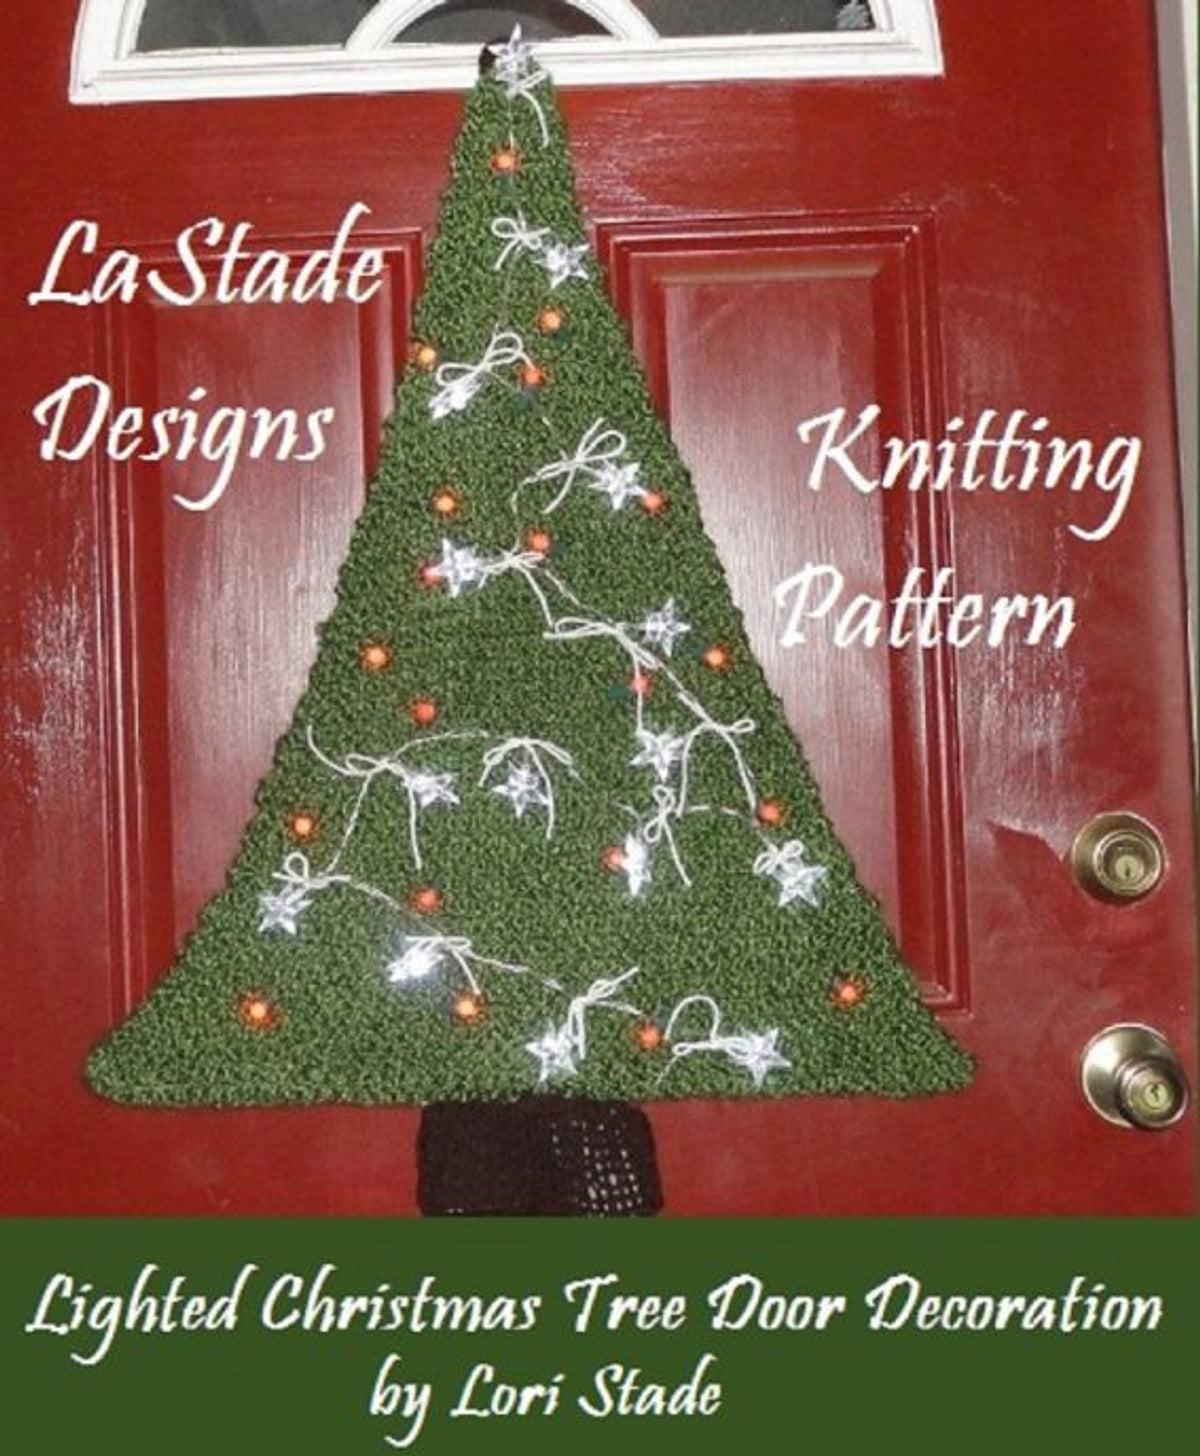 Lighted Christmas Tree Door Decoration Knitting Pattern Ebook By Lori Stade 9781301618545 Rakuten Kobo United States